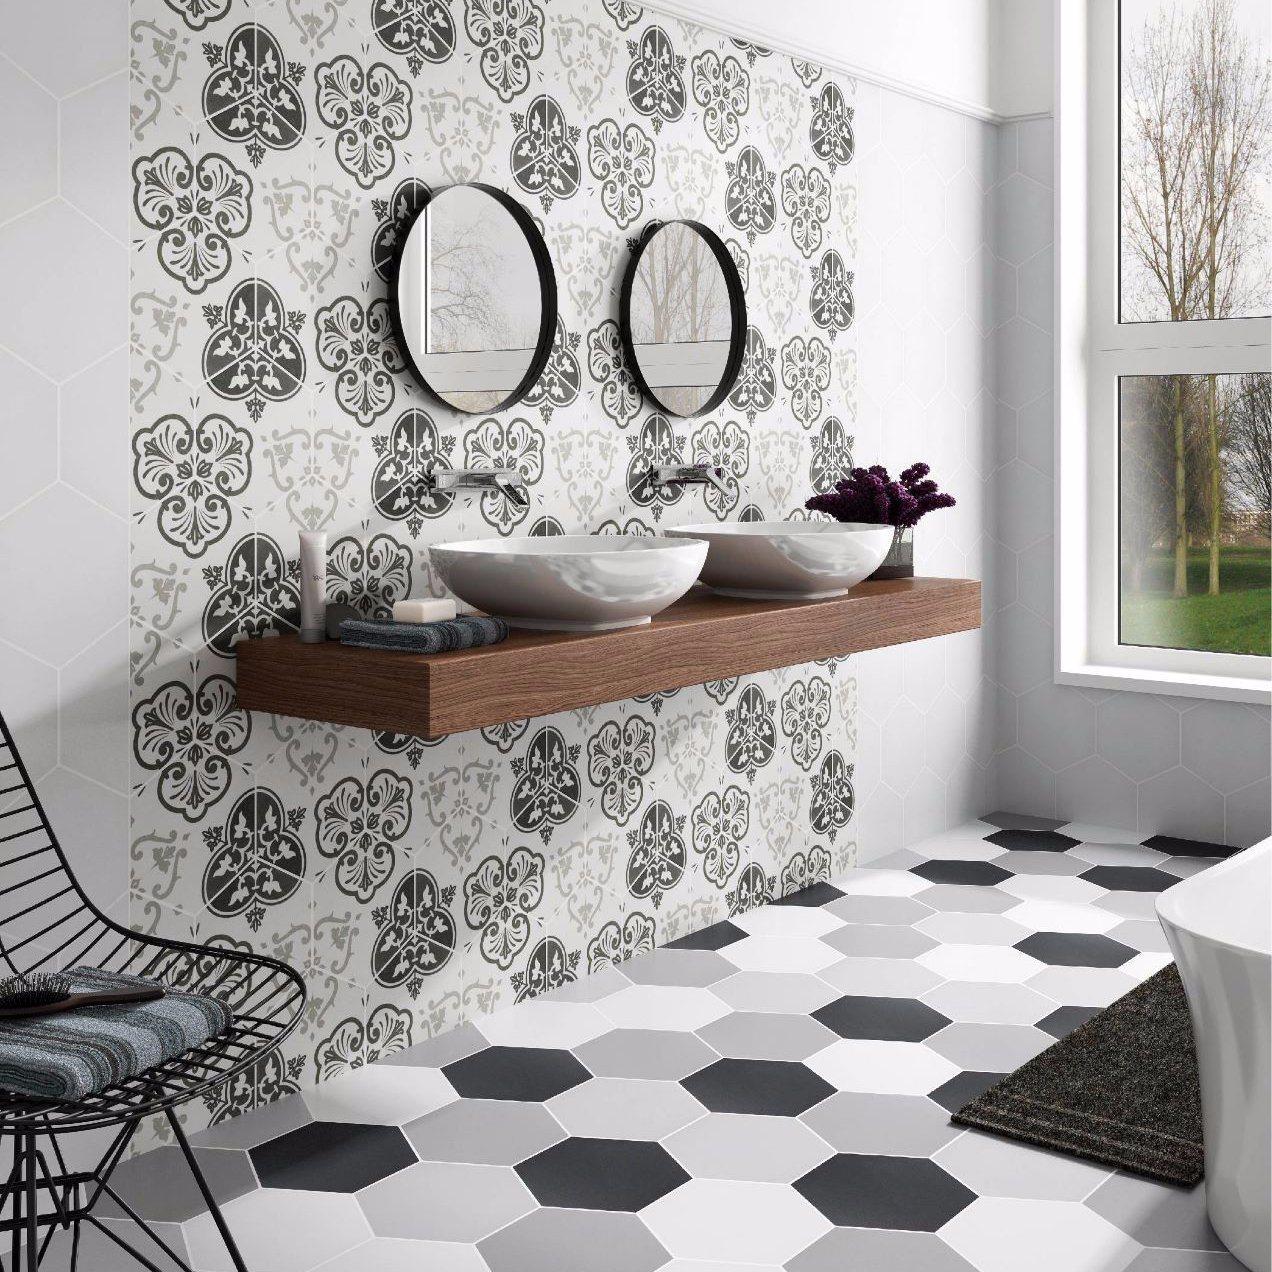 Hot Item Decorative Inkjet Pattern Ceramic Hexagon Floor Decor Tiles